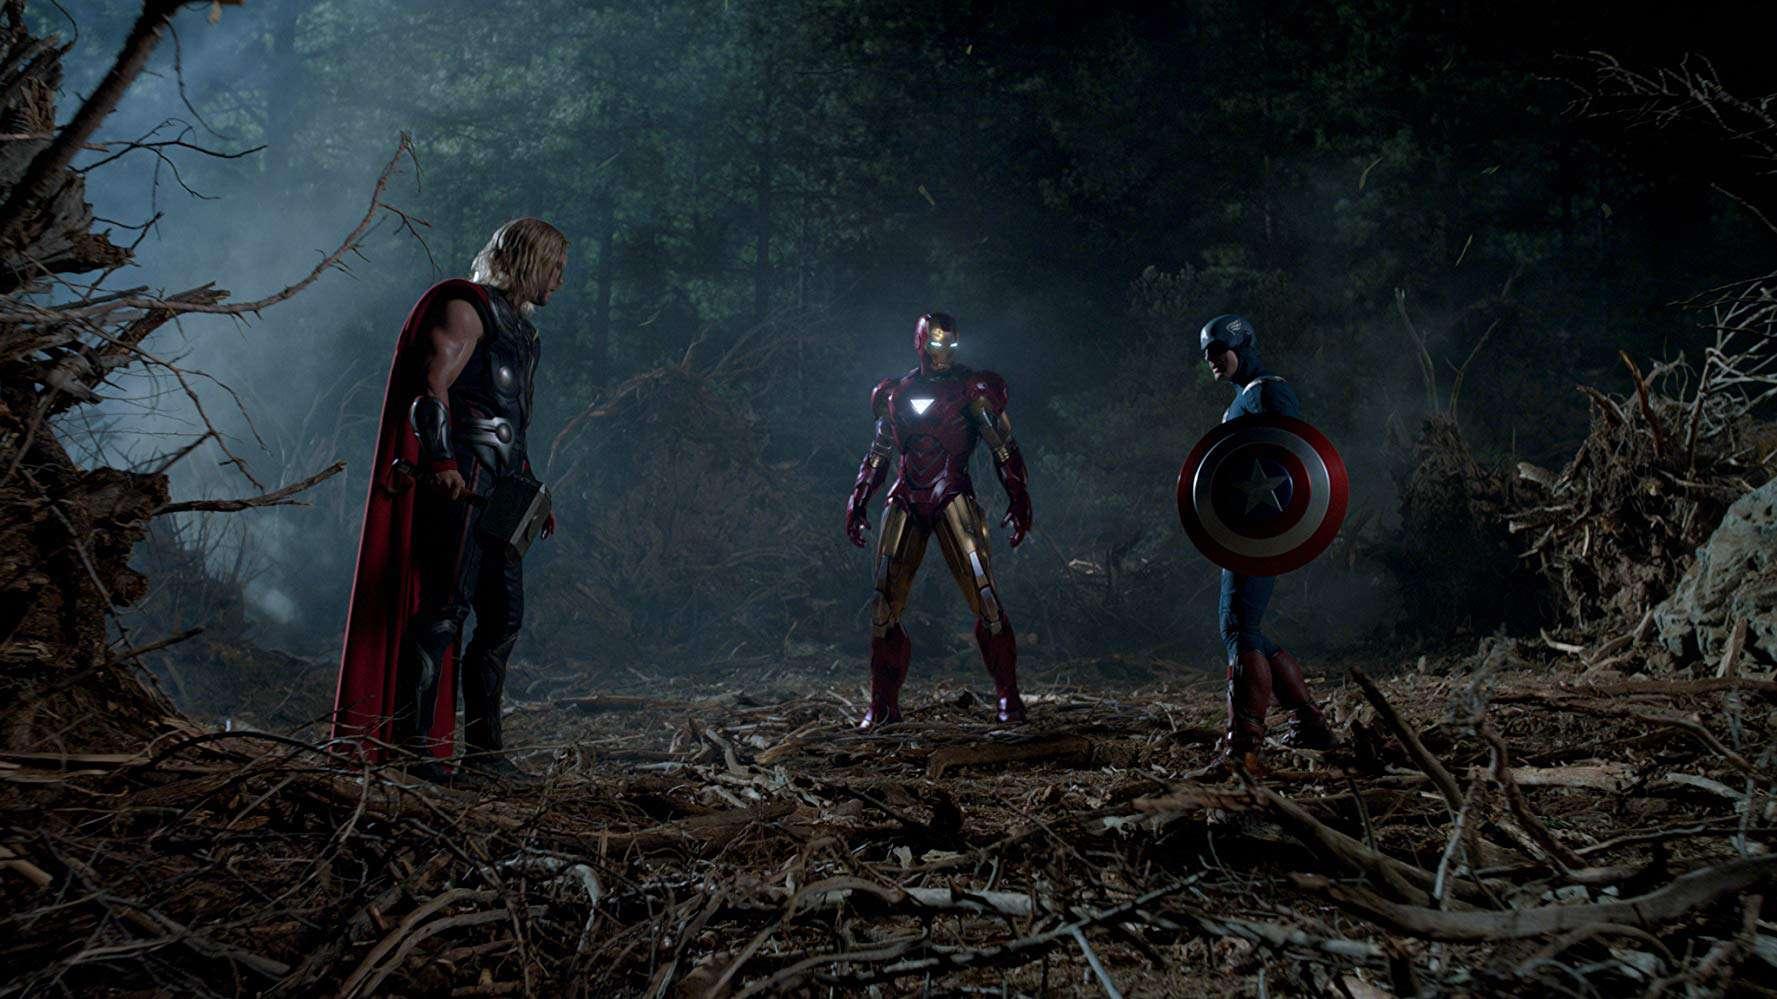 復仇者聯盟_The Avengers_電影劇照